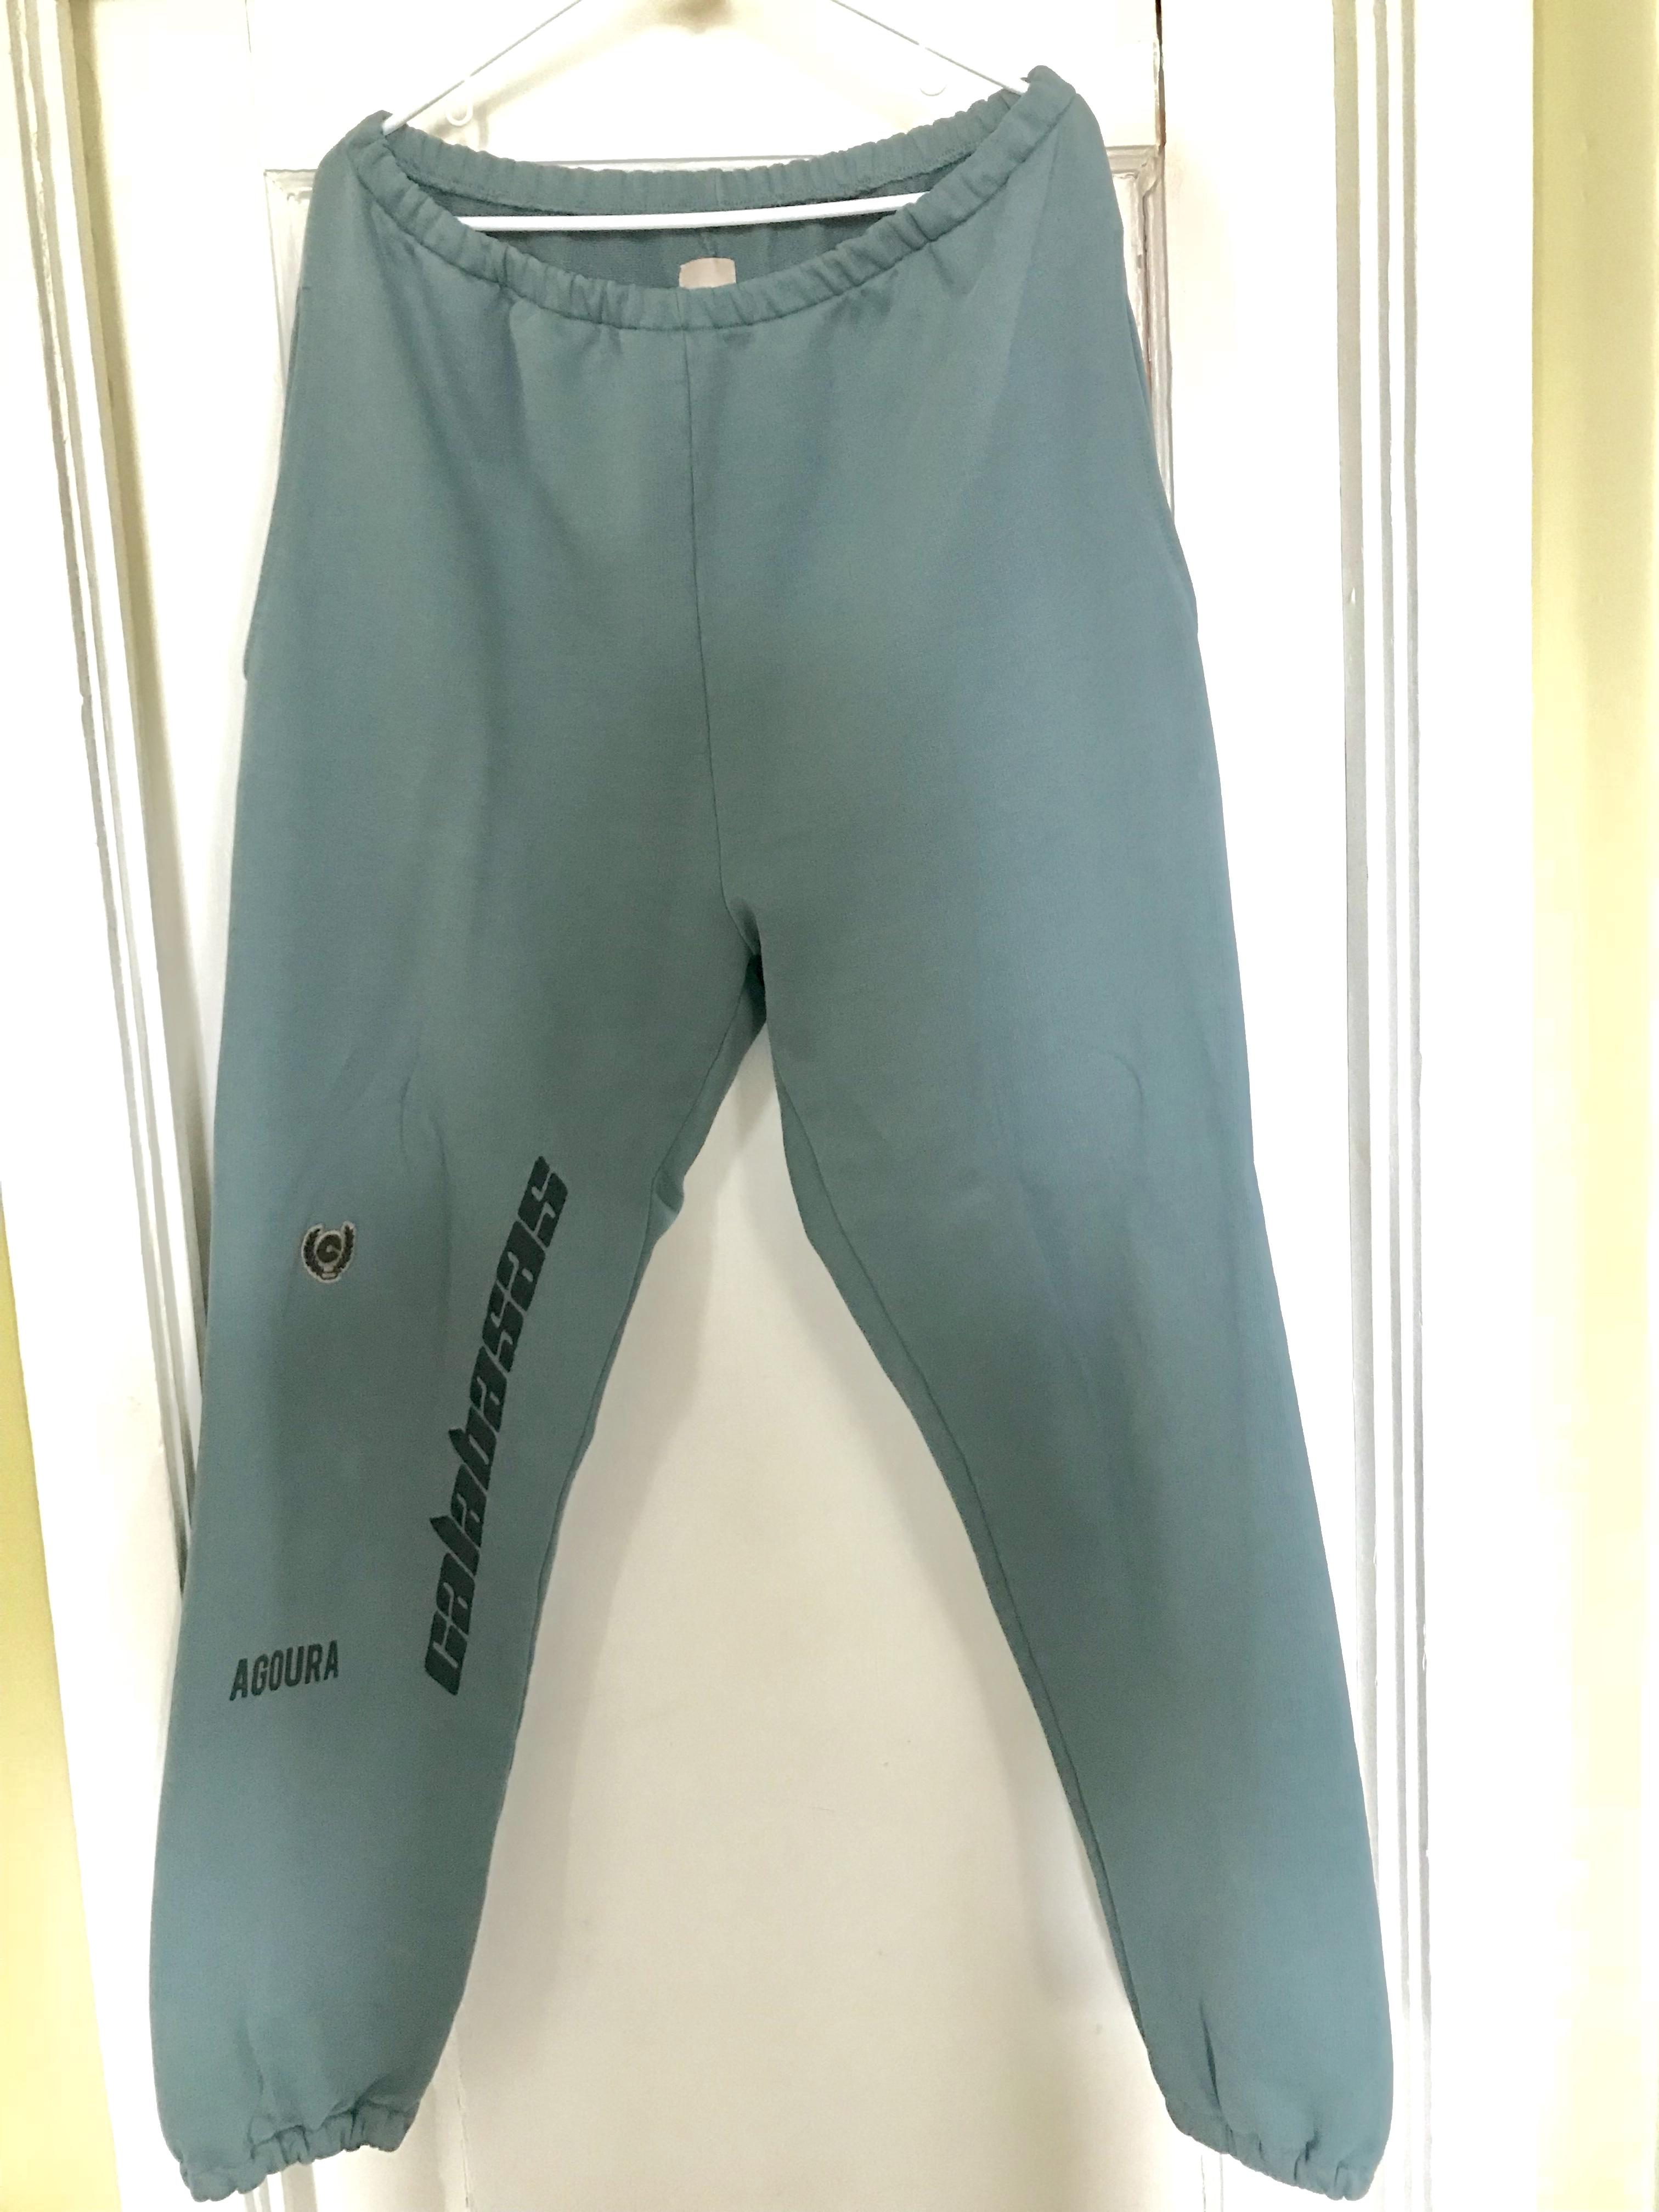 2d1c0f601 Yeezy Season ×. Yeezy Season 5 Hospital Blue Embroidered French Terry  Sweatpants XL